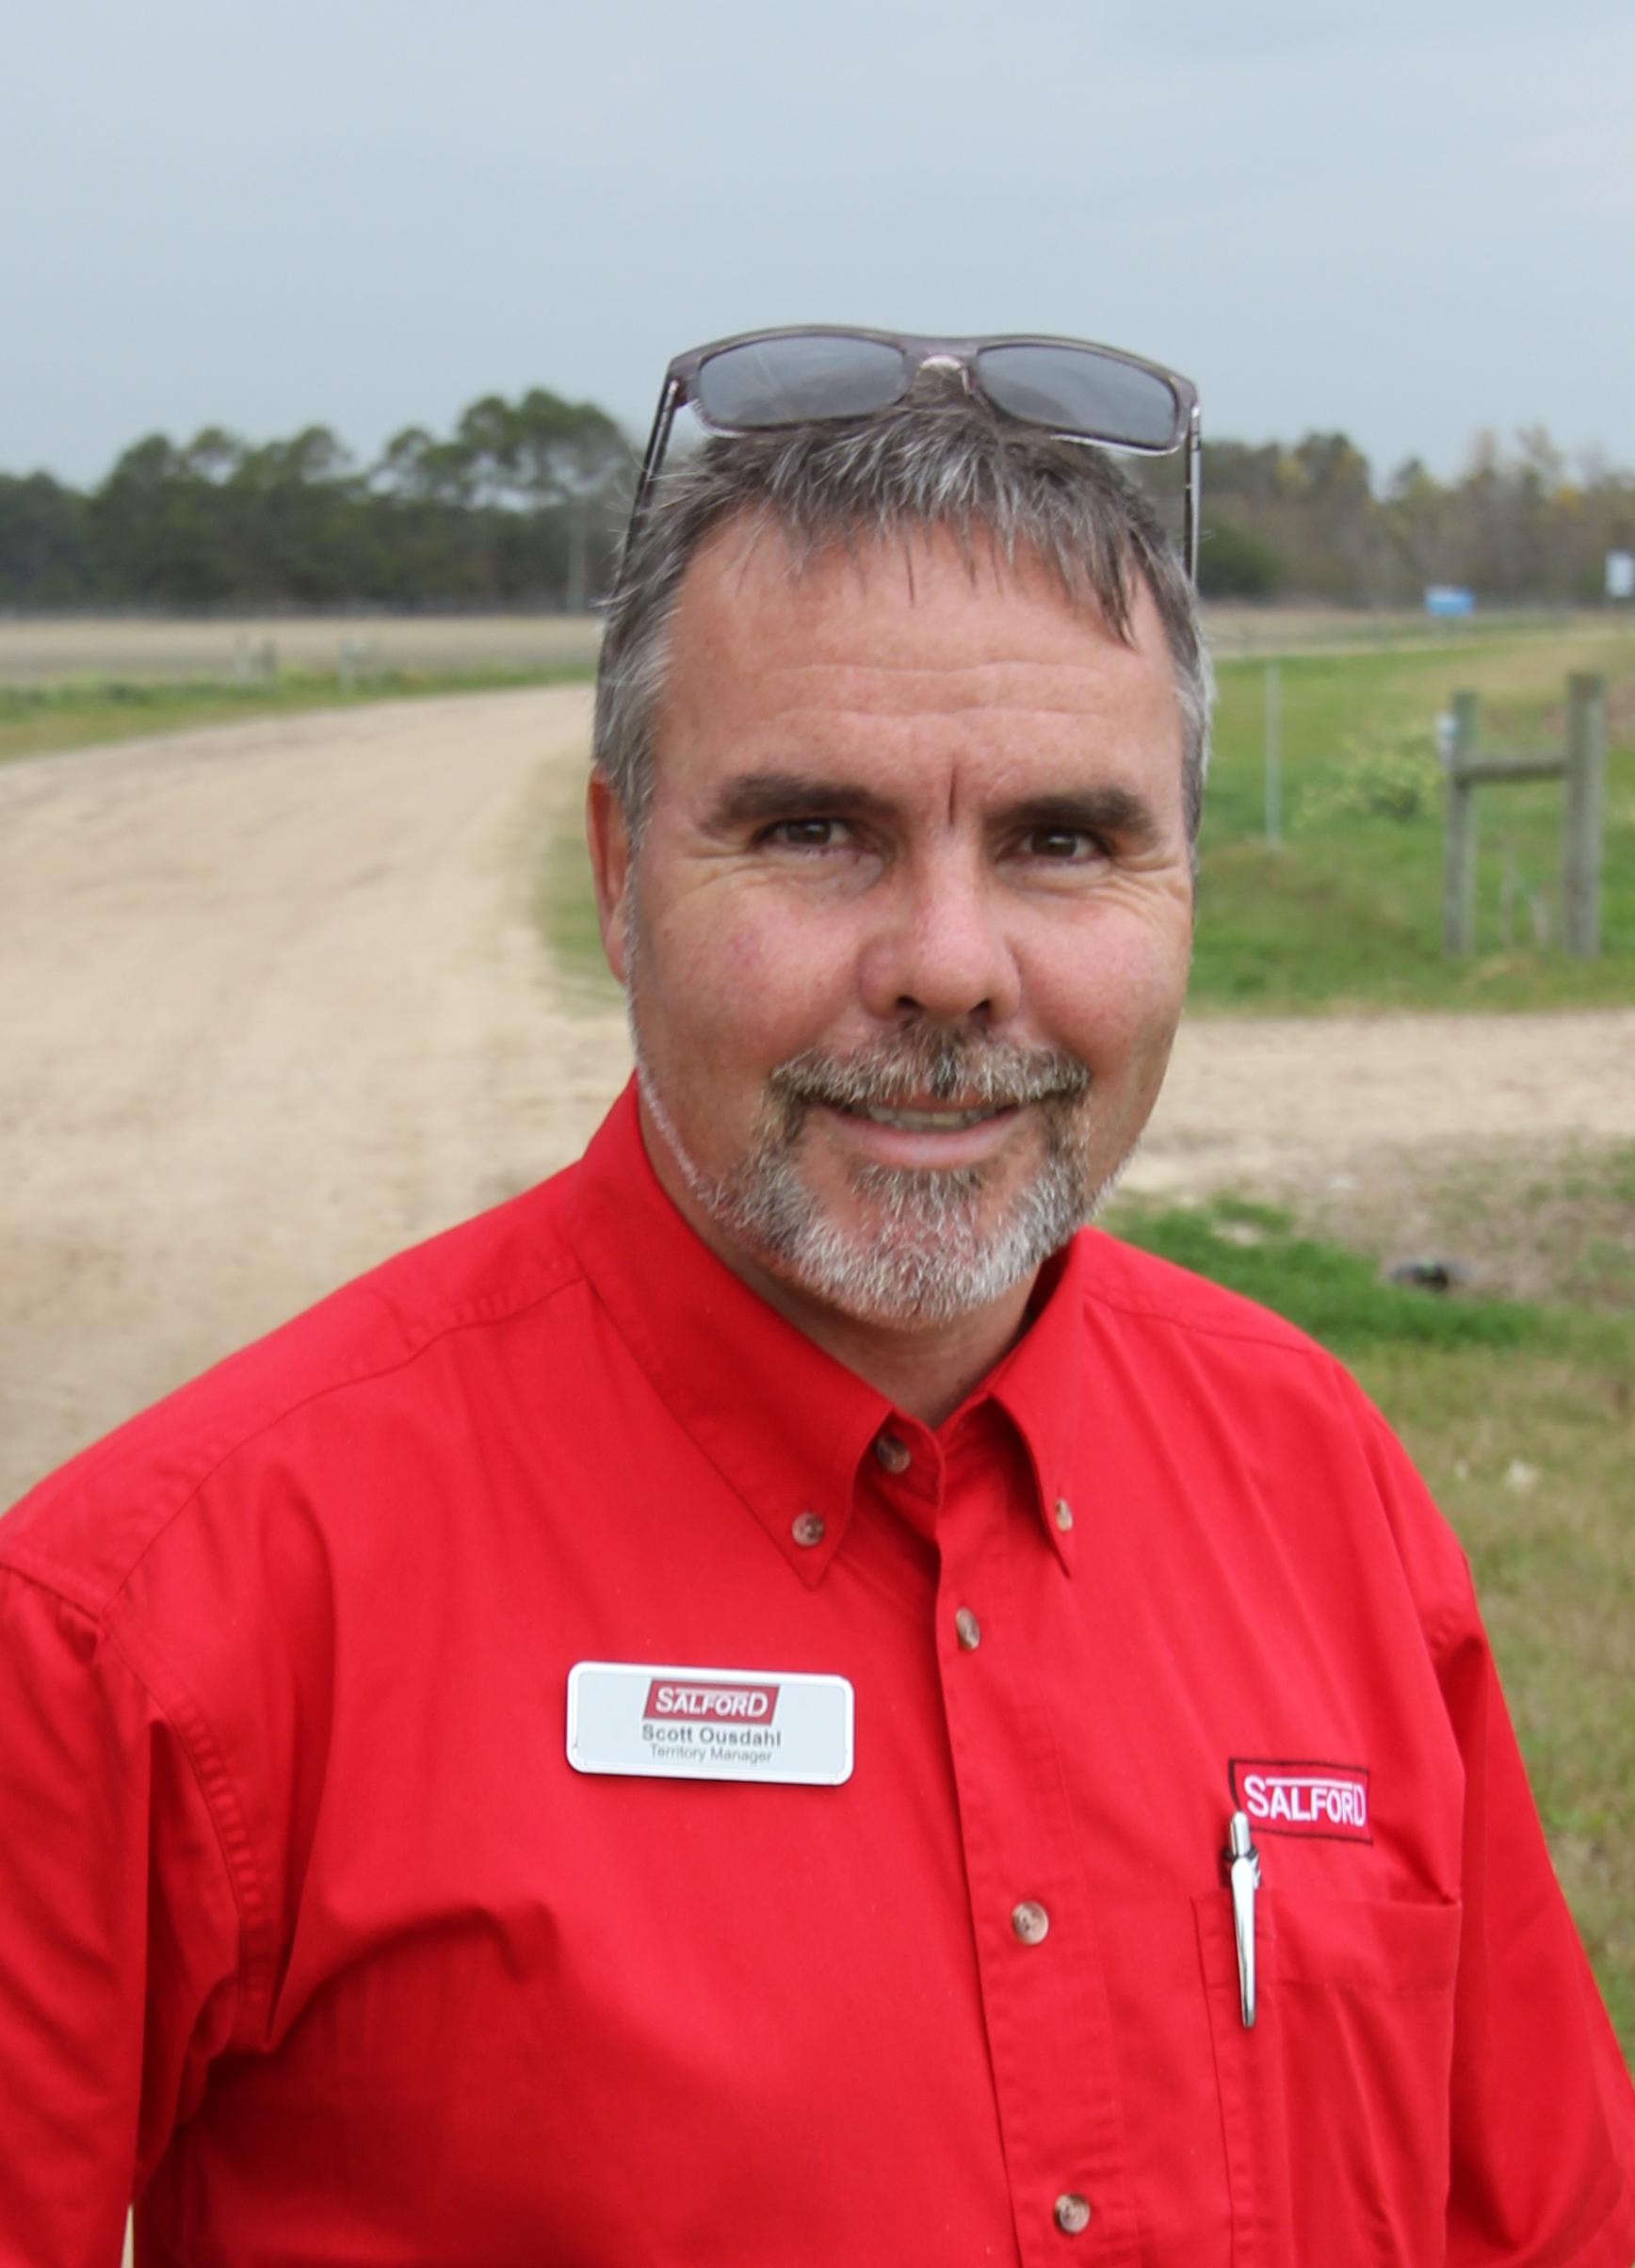 Scott Ouzdahi Salford Group Territory Manager